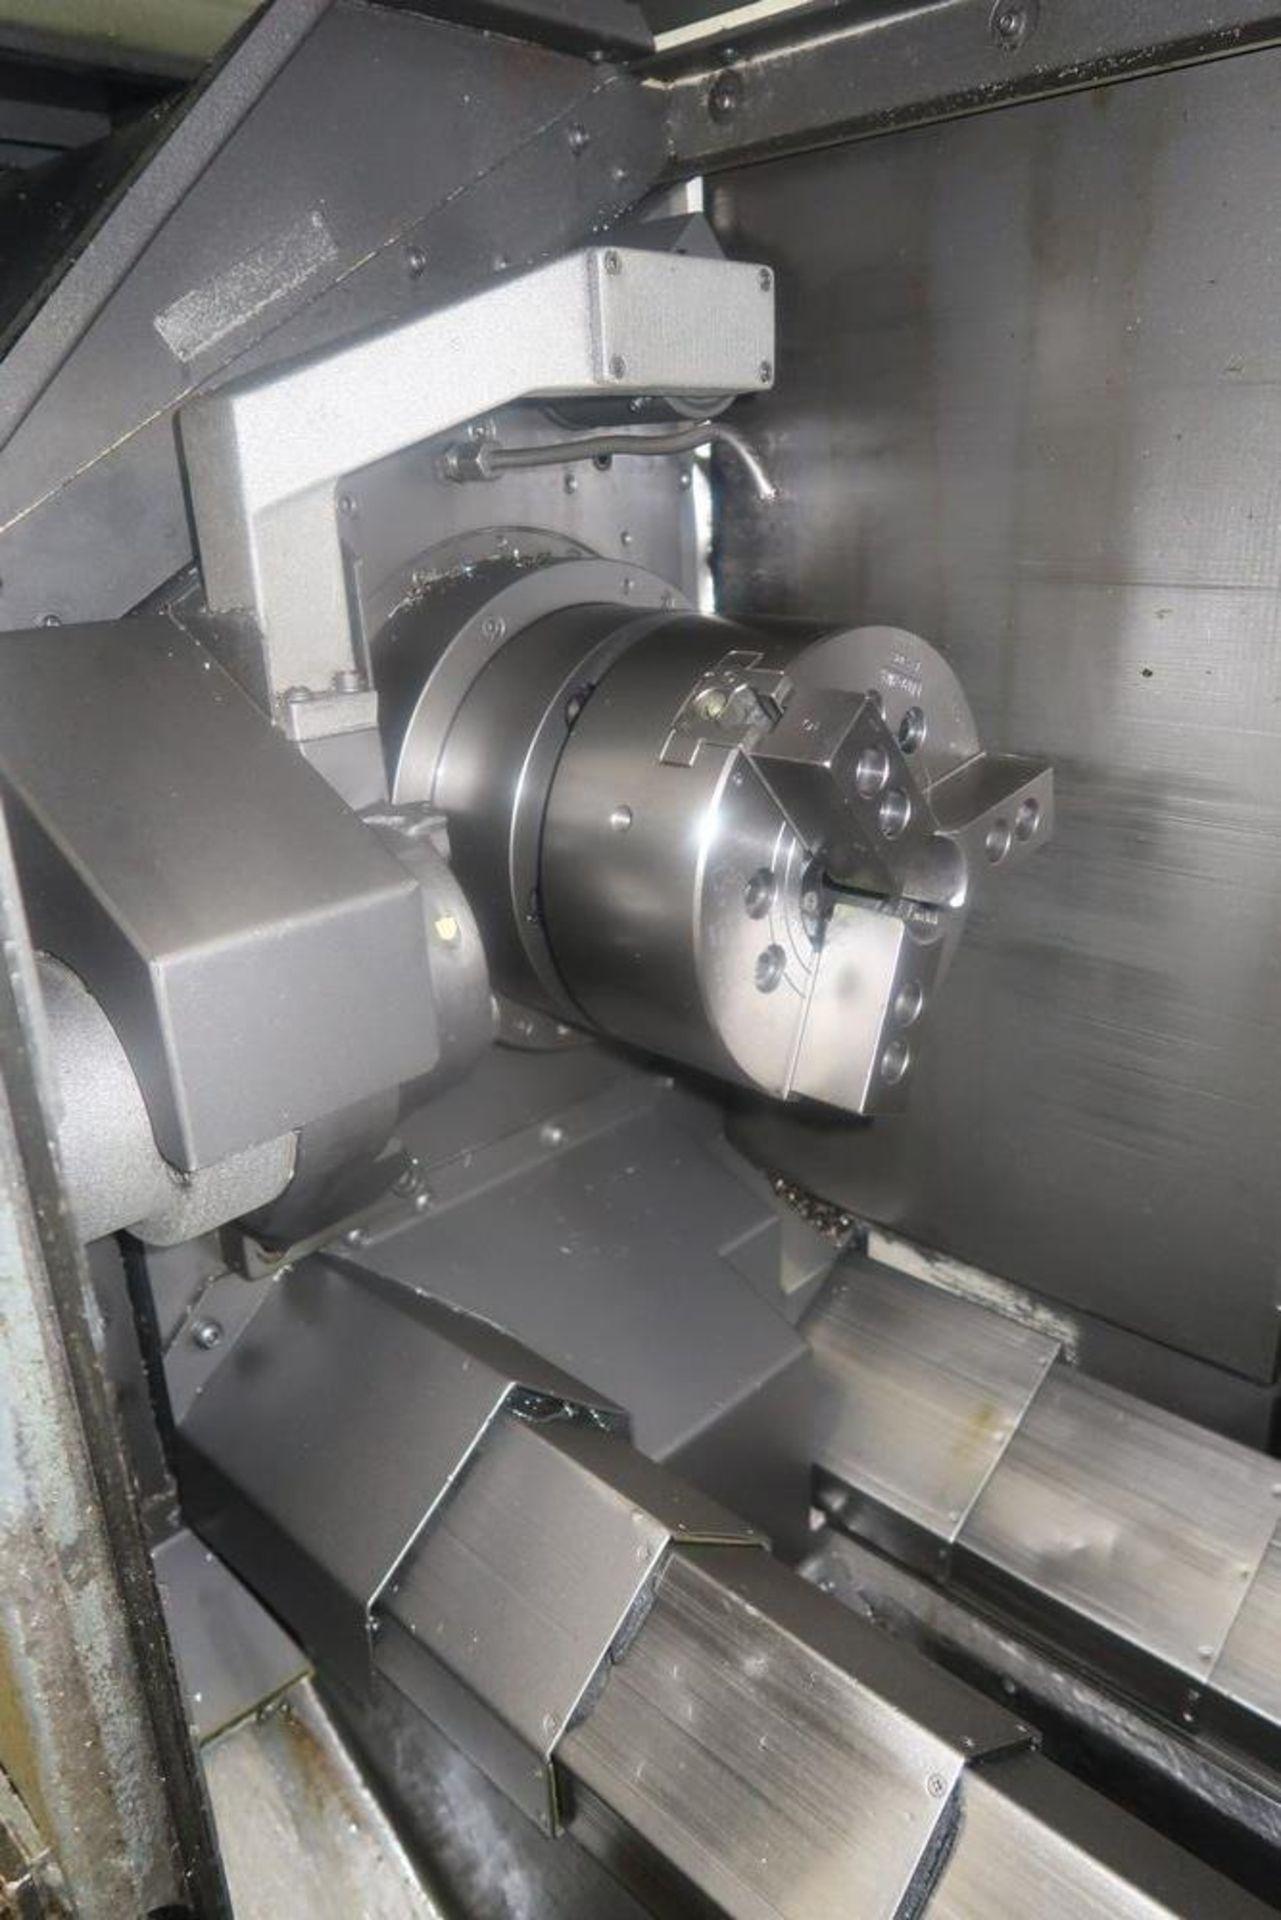 Mazak Dual Turn 25 Twin Spindle CNC Turning Center lathe, S/N 150888 - Image 5 of 13